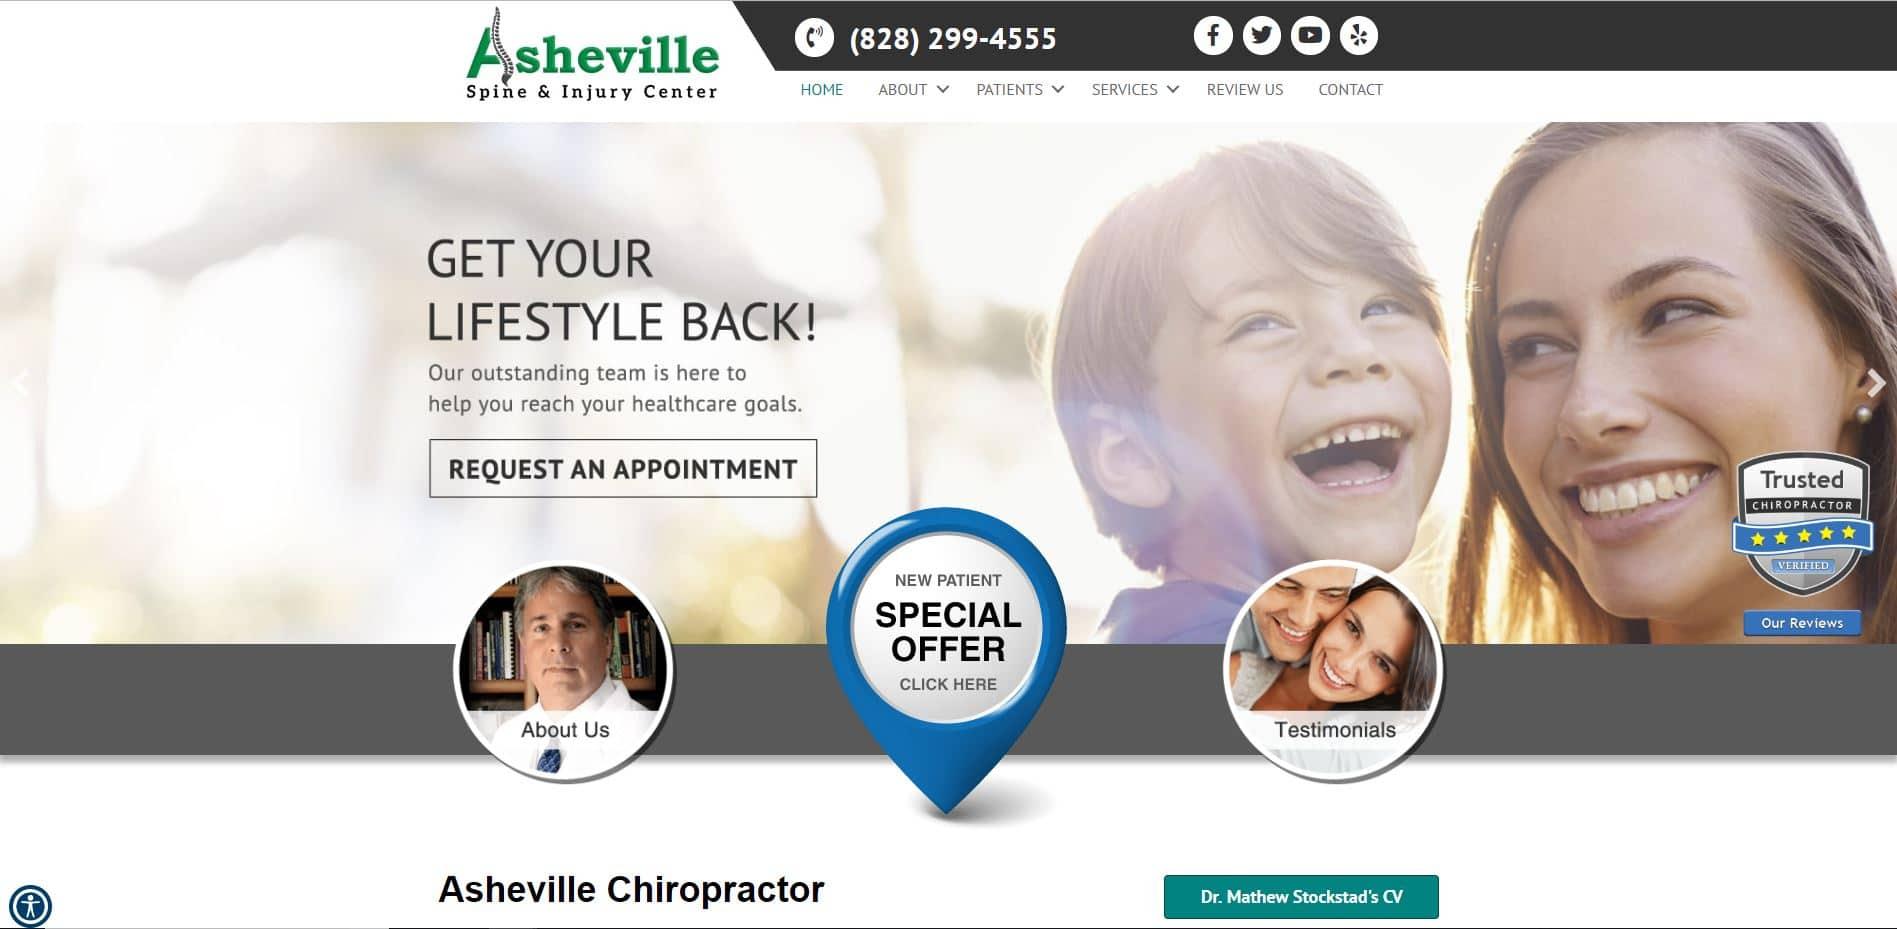 Chiropractor in Asheville